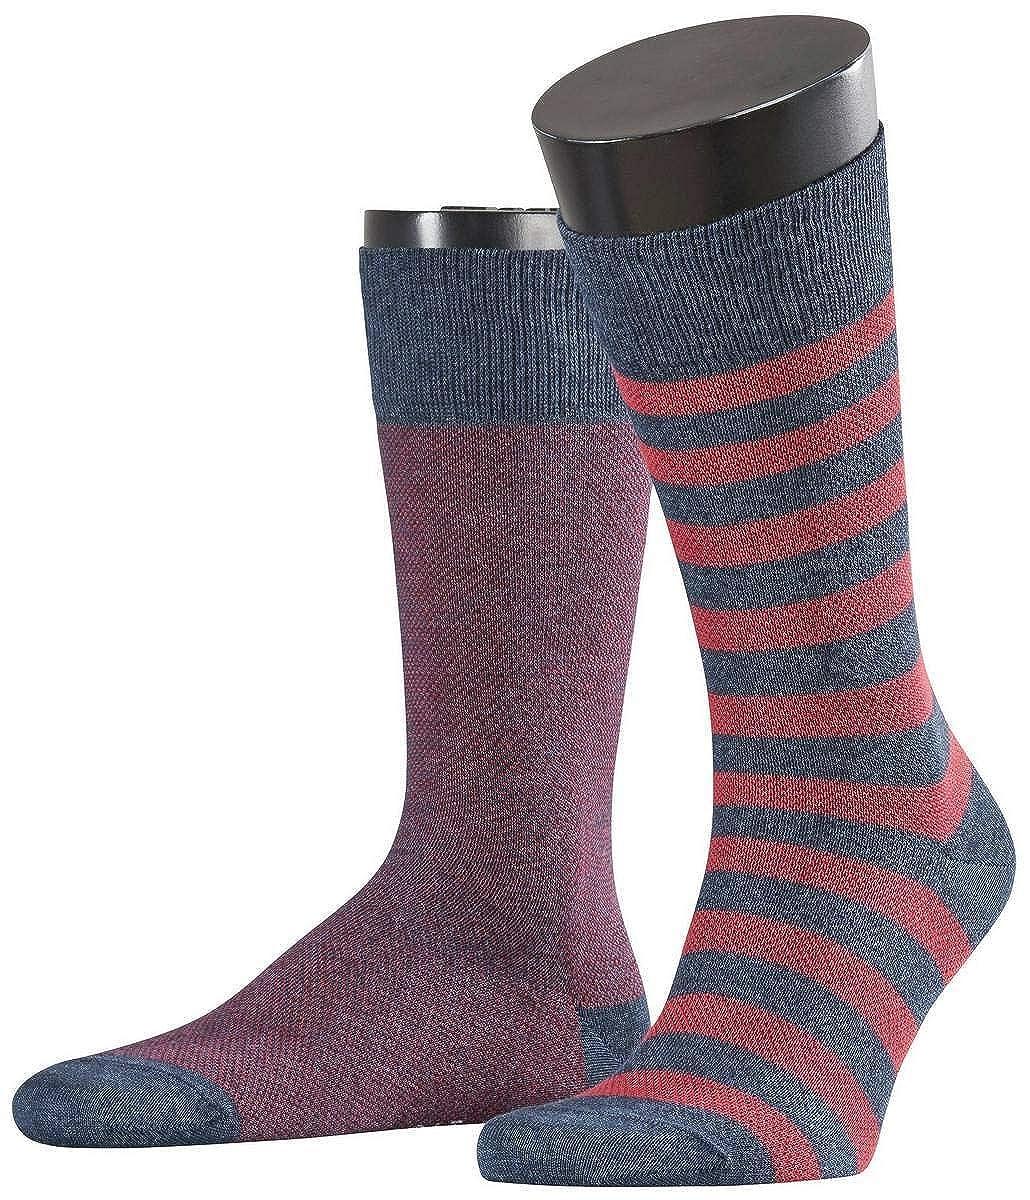 4325ddba242fb Esprit Mens Pique Stripe 2 Pack Socks - Navy Melange/Red at Amazon Men's  Clothing store: